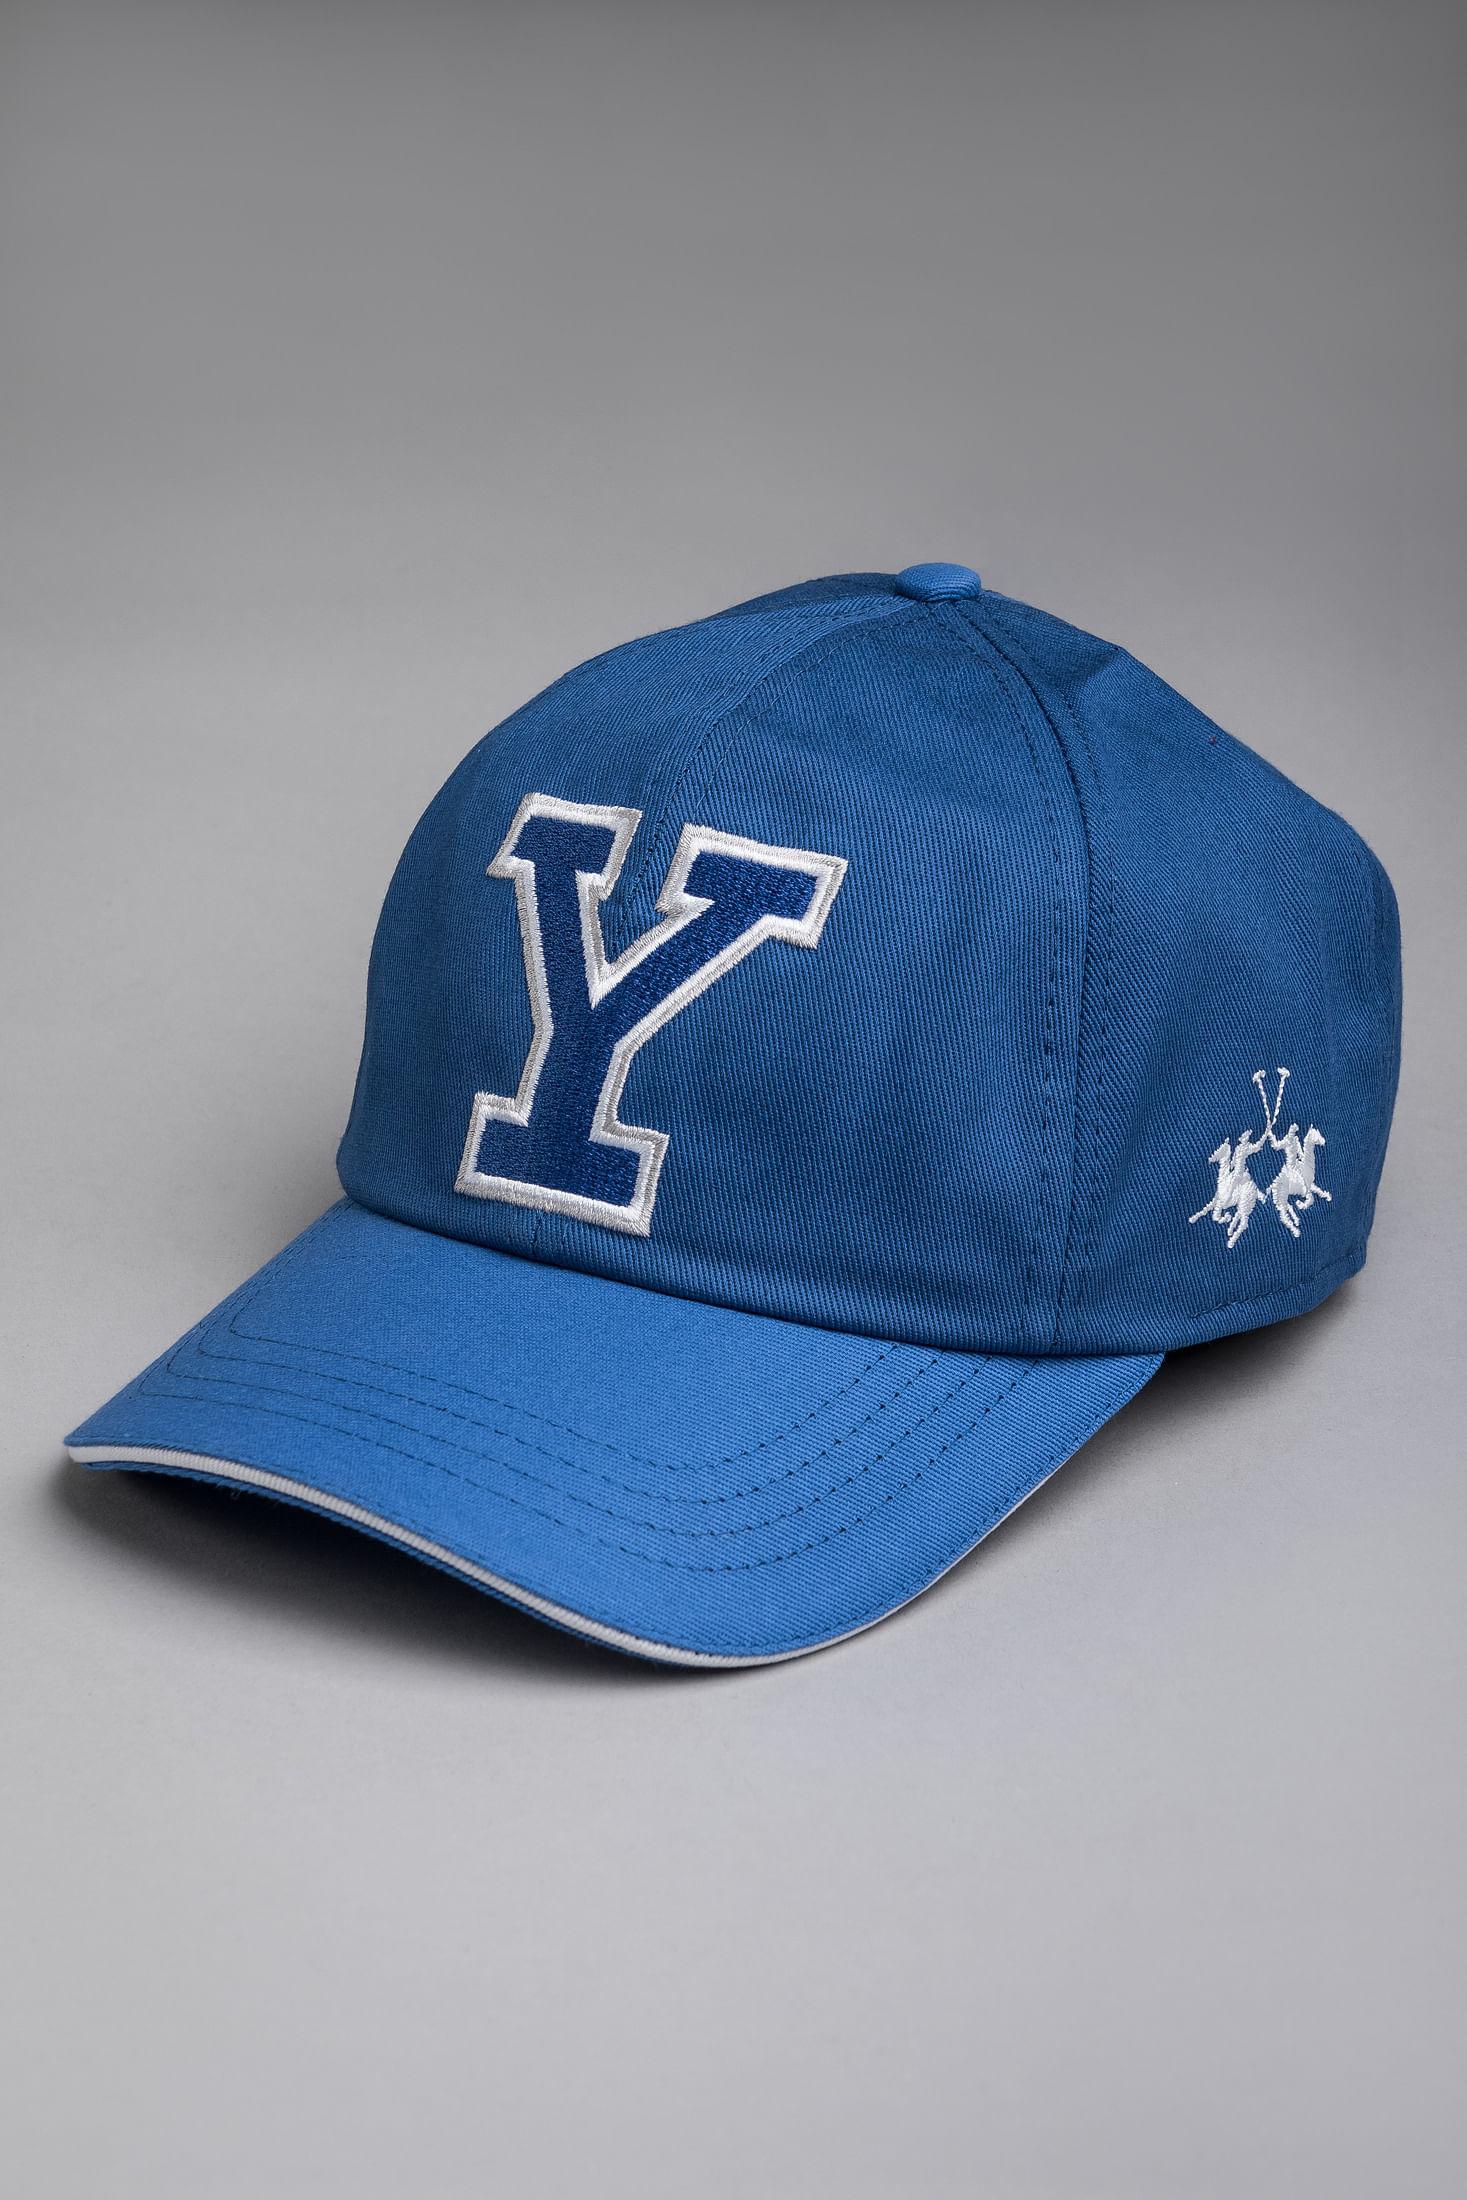 CAP-EQUIPO-UNIVERSITY-YALE